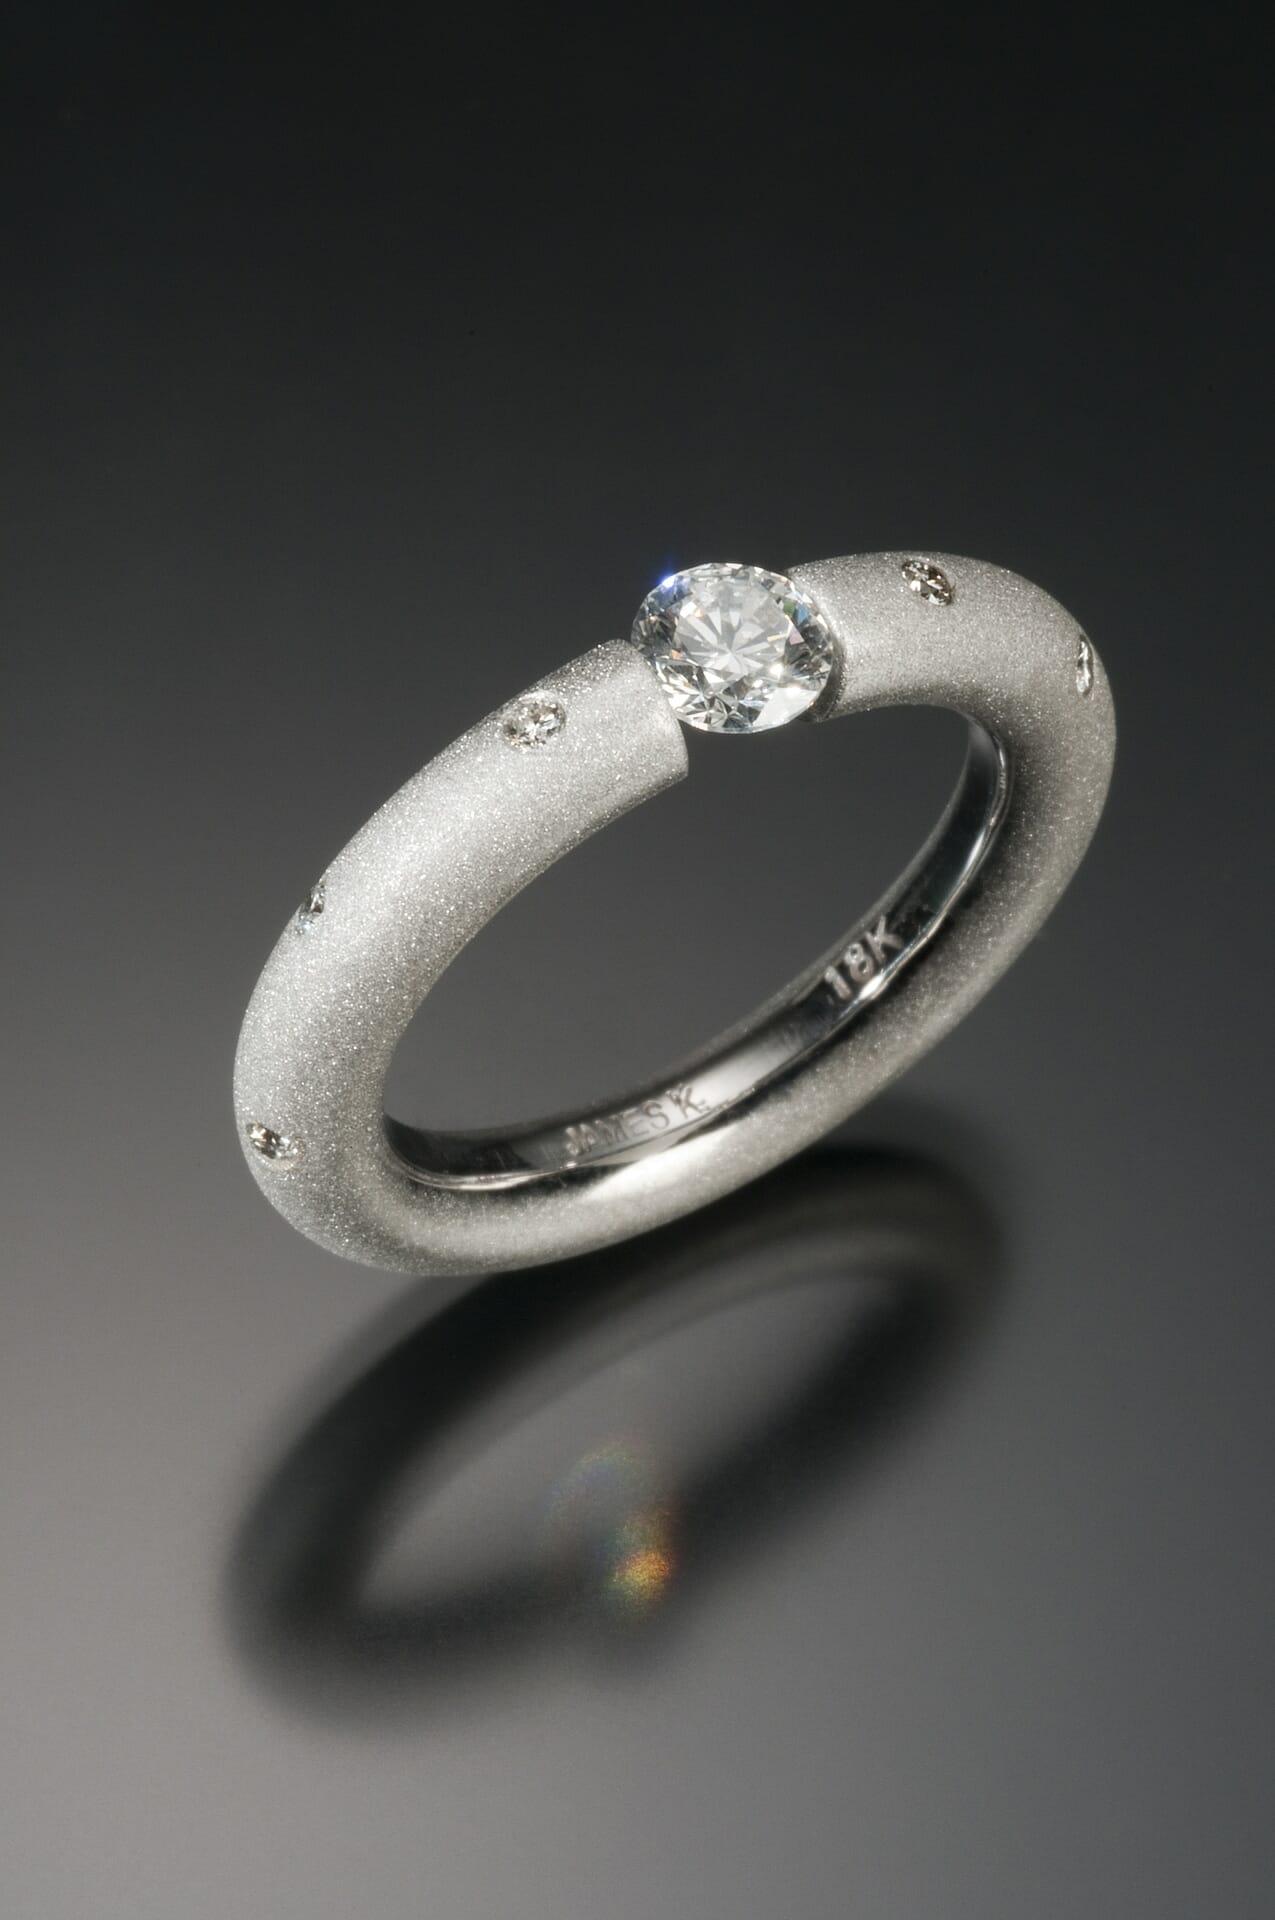 18K Tension Set Diamond Ring Keezing Kreations Boston MA